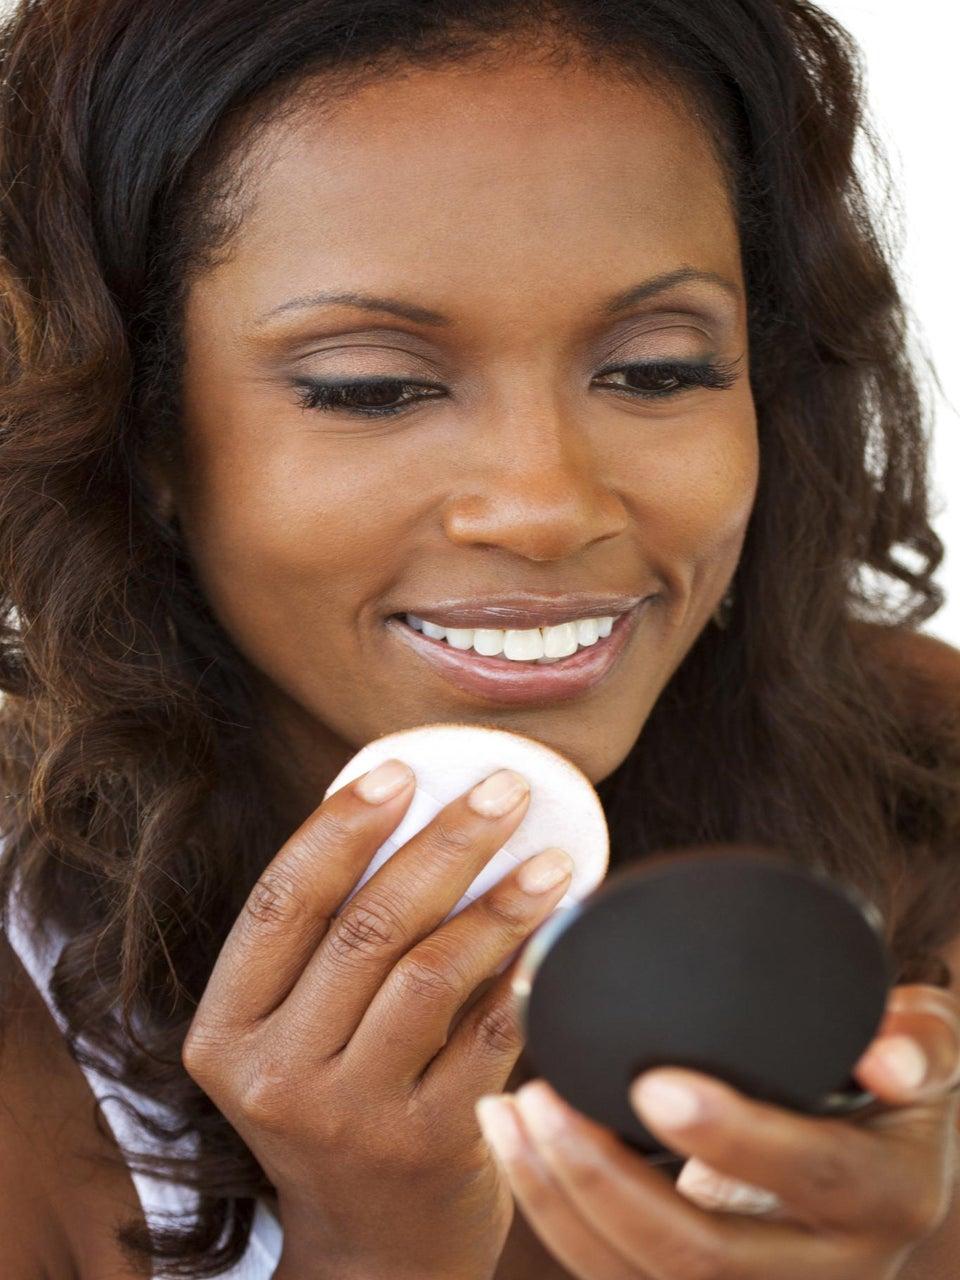 10 Beauty Manifestos You Should Live By